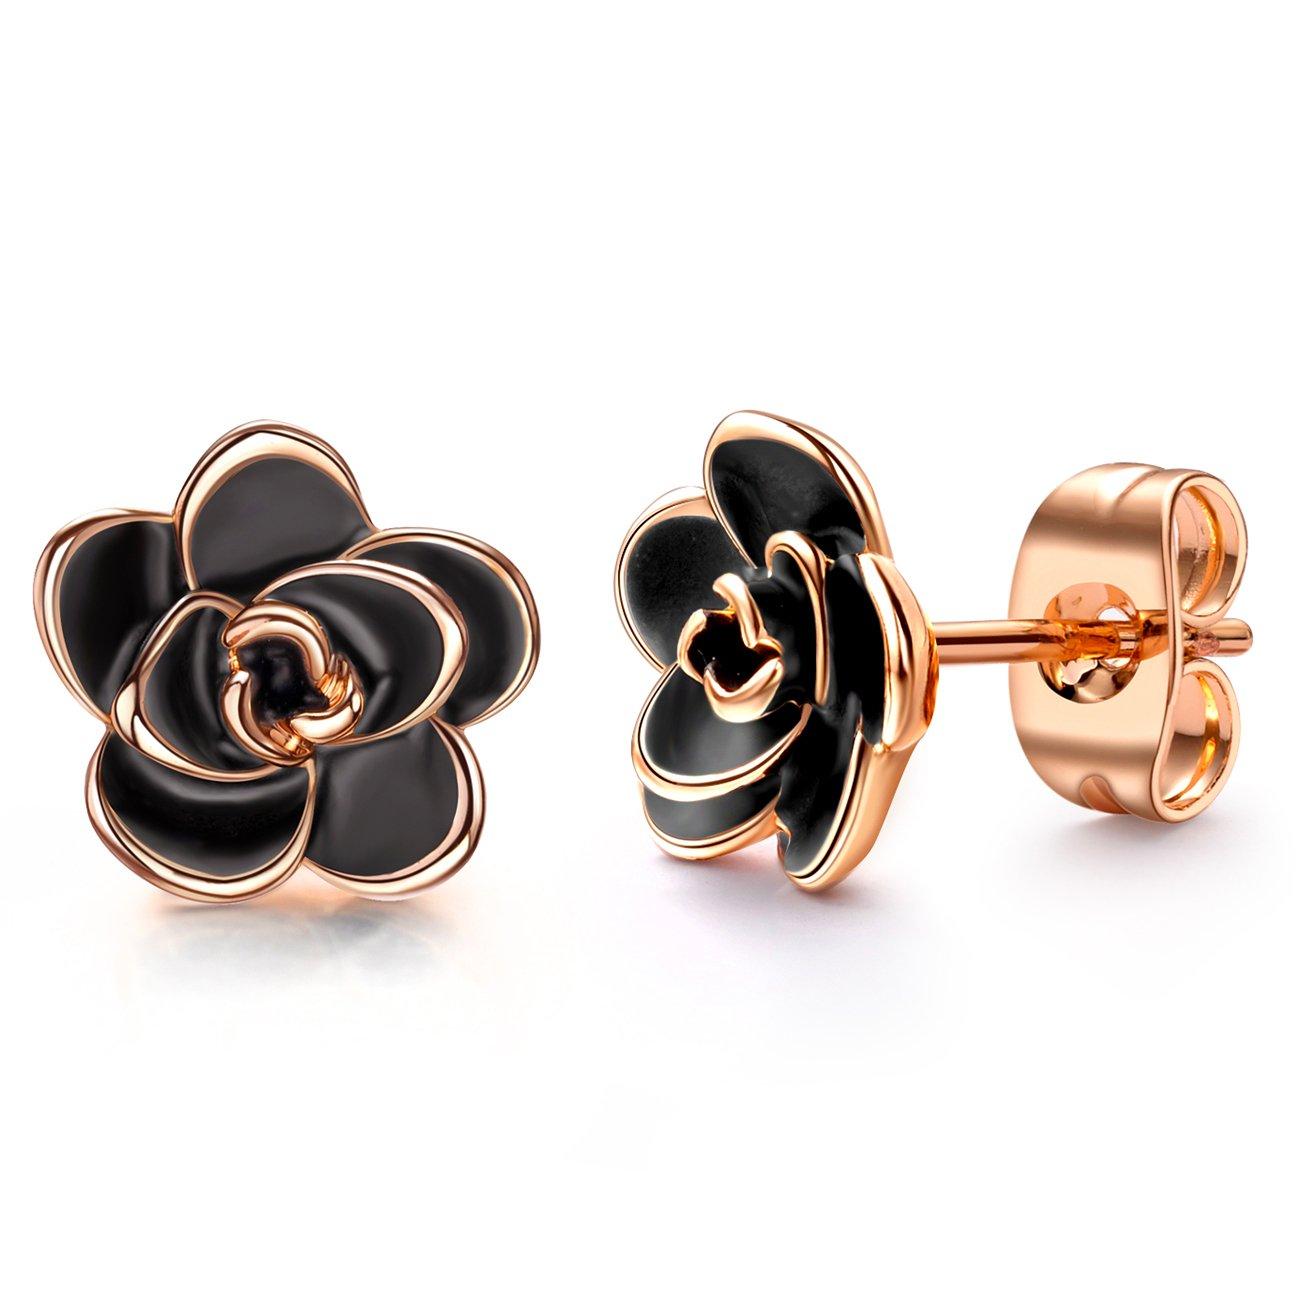 AllenCOCO 18K Gold Plated Black Rose Flower Stud Earrings for Women by AllenCOCO